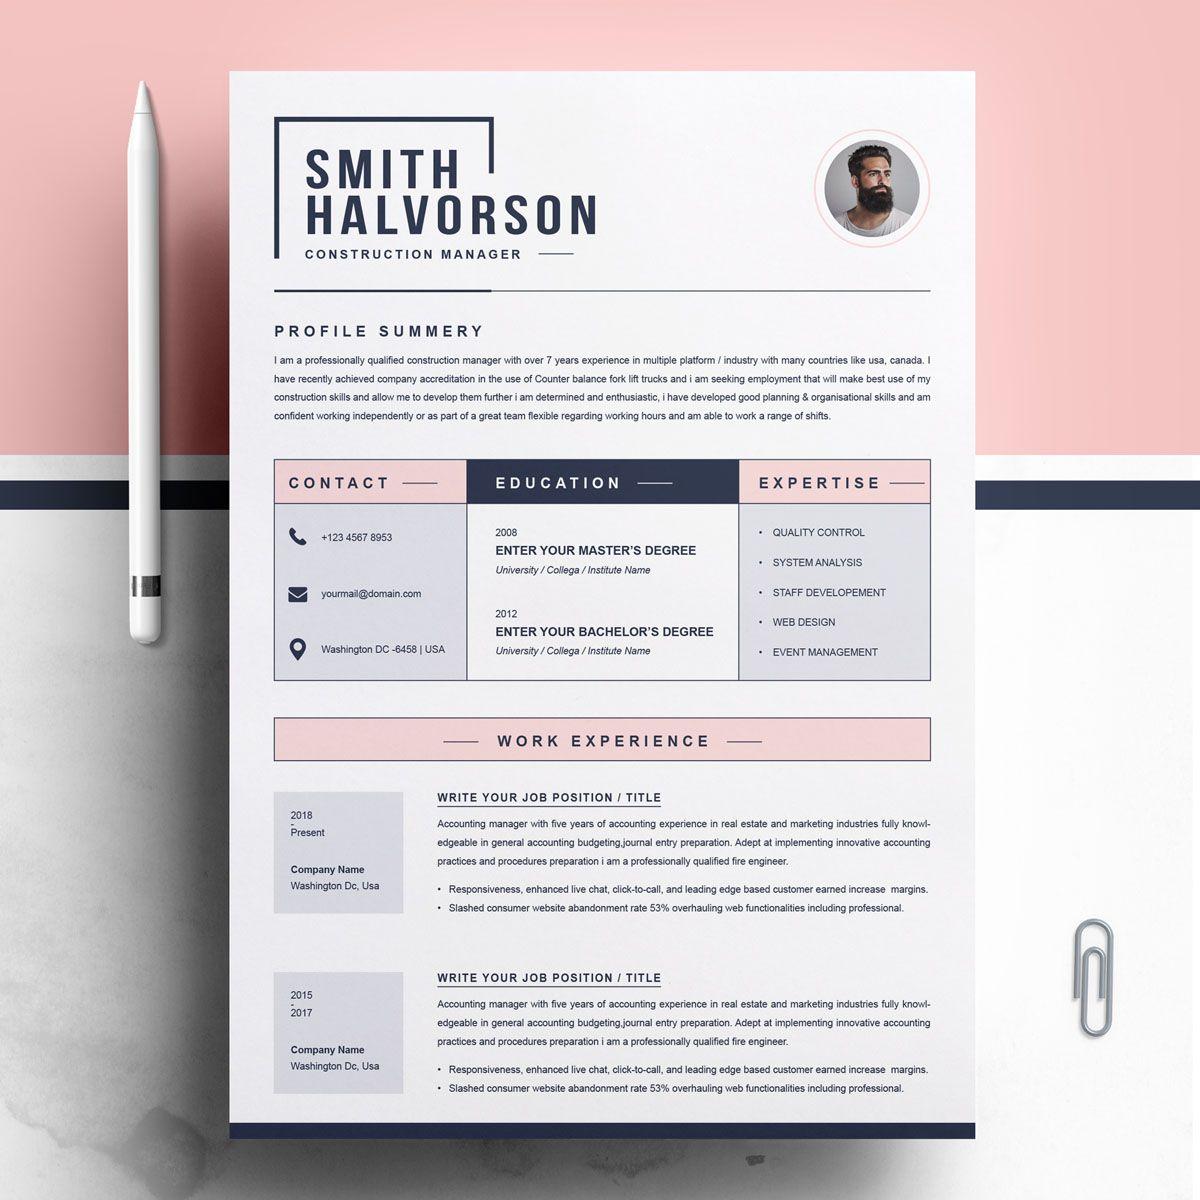 Smith Halvorson Resume Template 77956 Creative resume